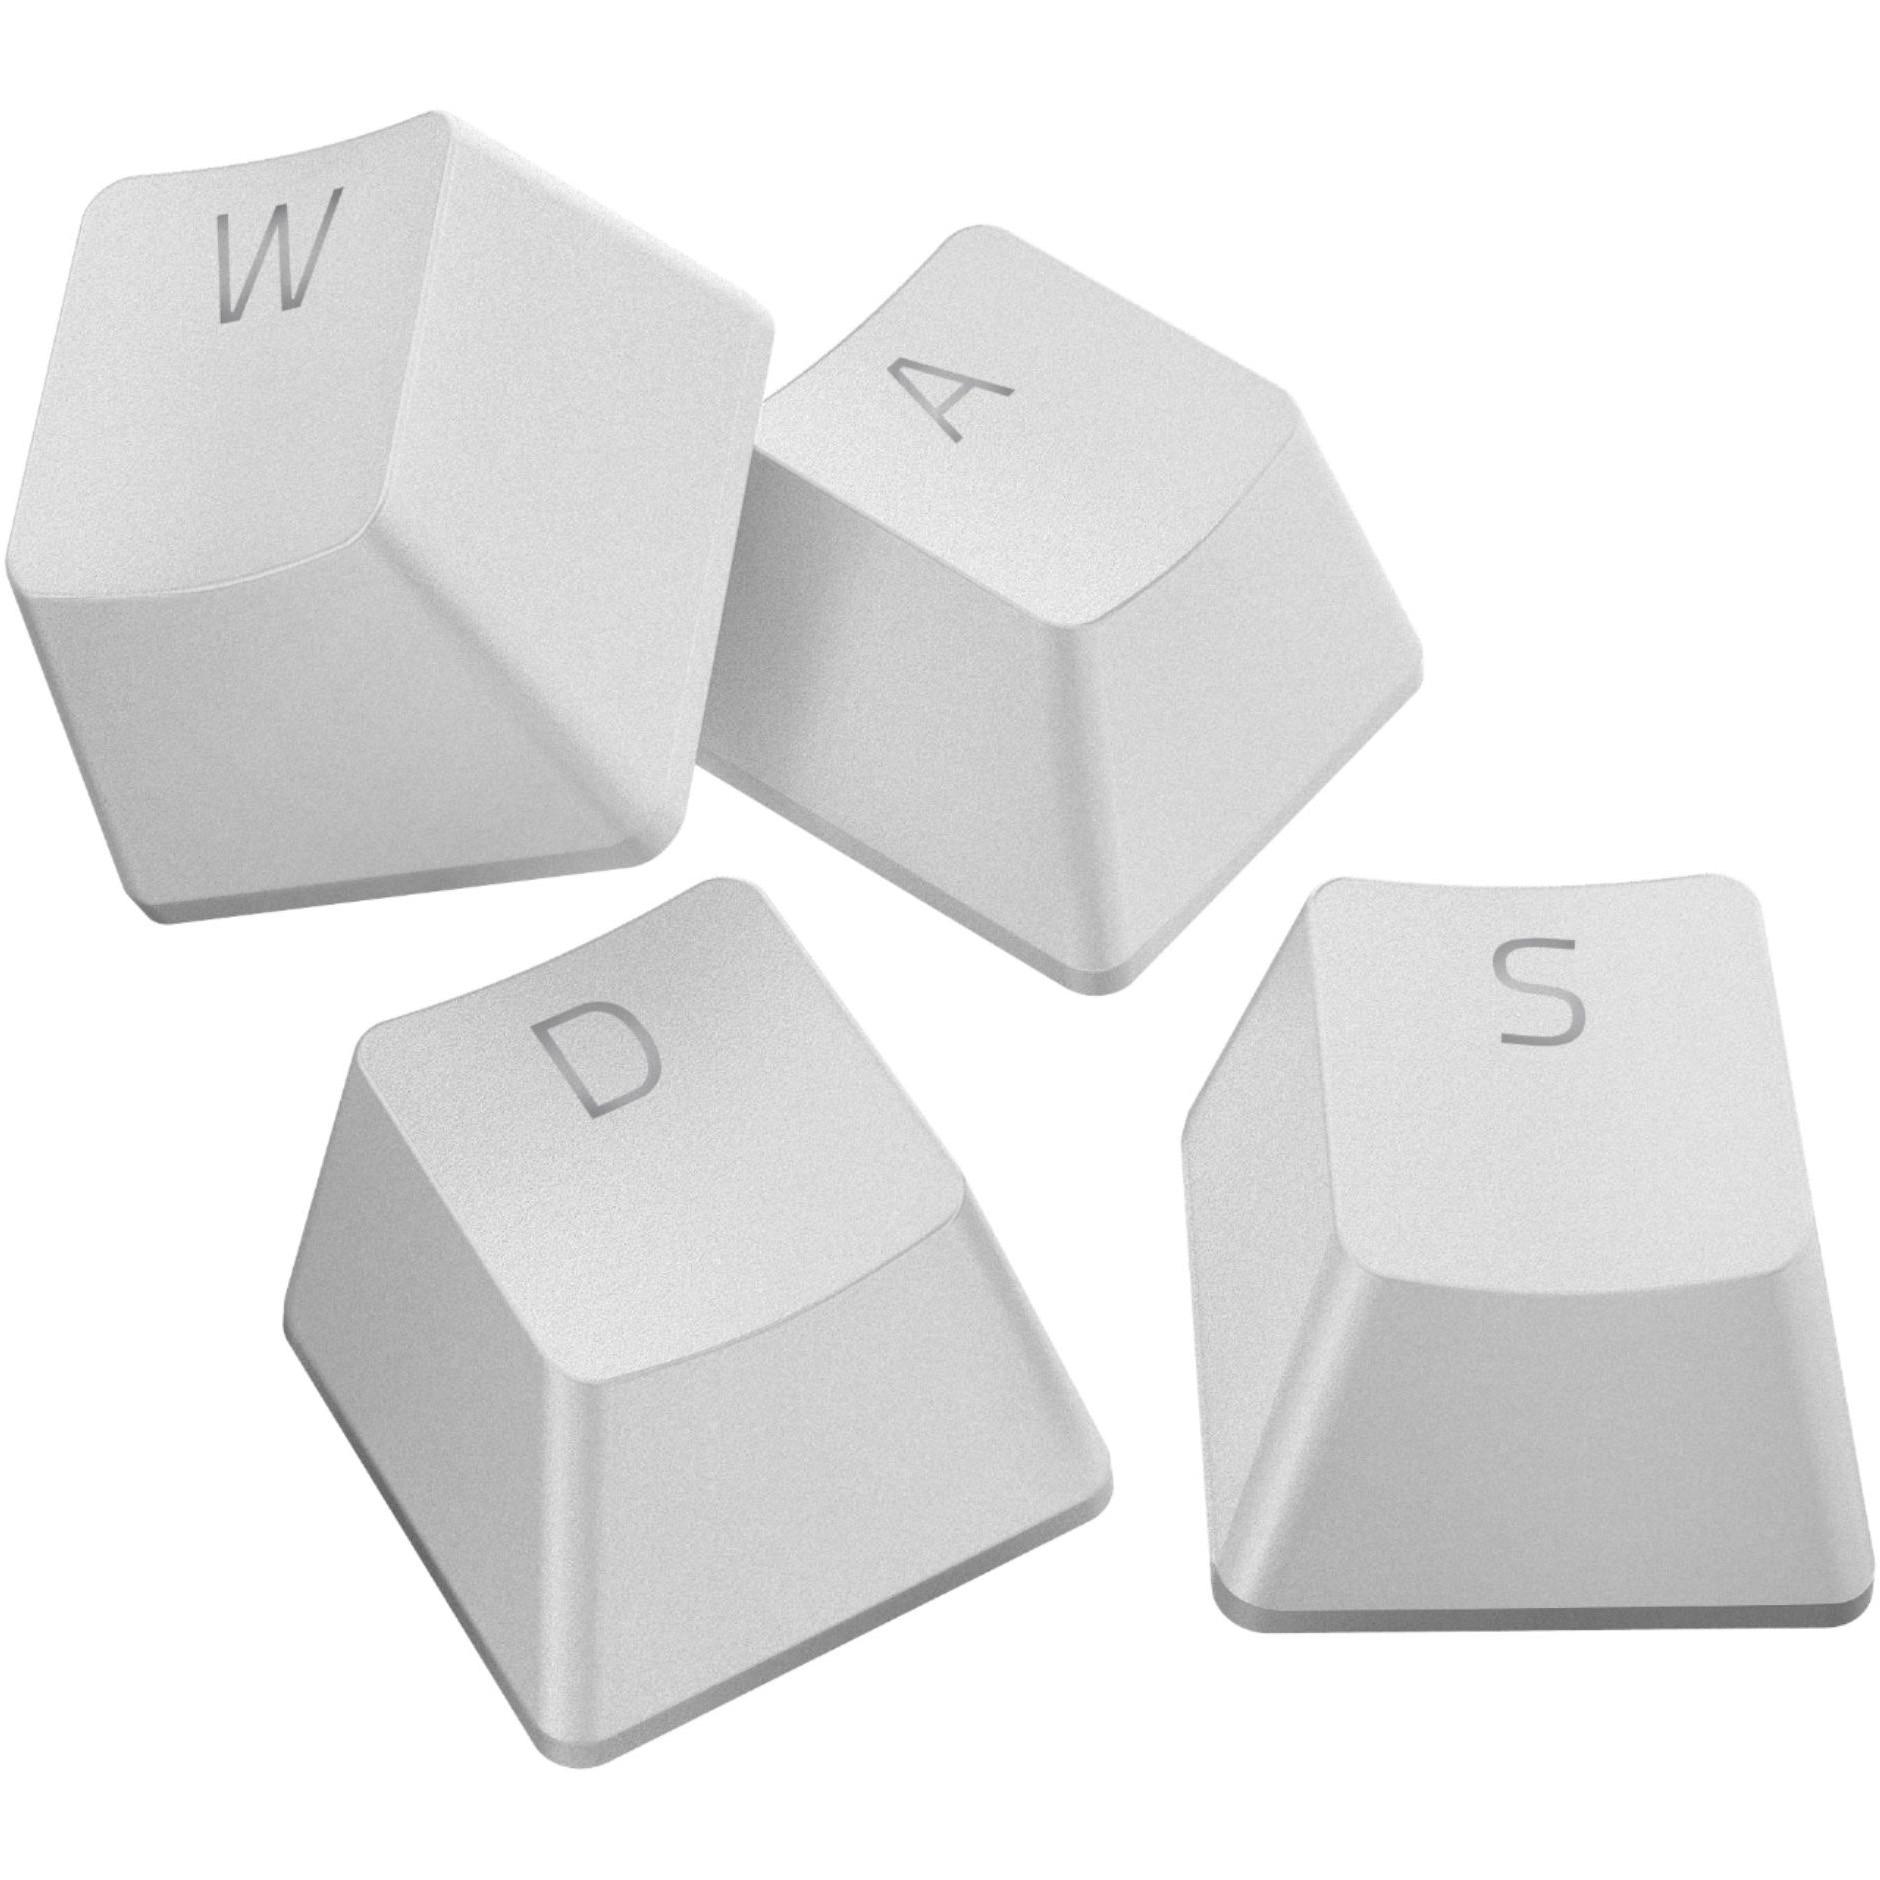 Fotografie Kit butoane tastatura Razer PBT Doubleshot, compatibile switch mecanic si optic Razer - Mercury White